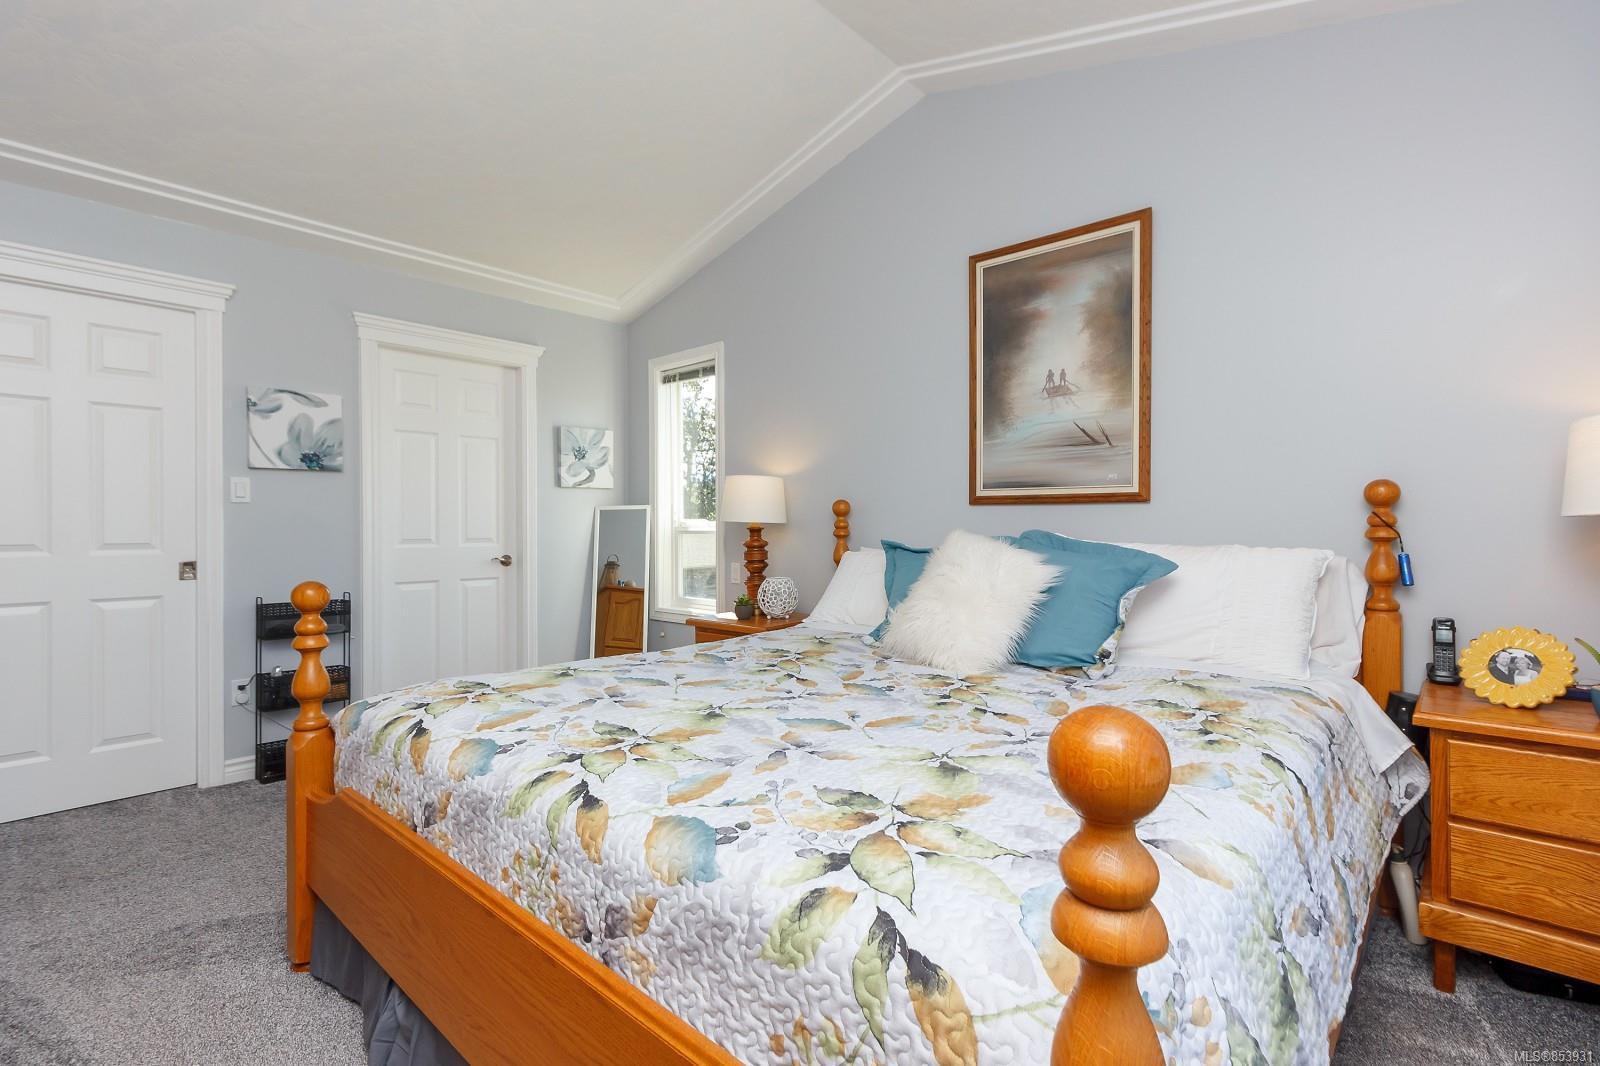 Photo 12: Photos: 2456 Timbercrest Dr in : Du East Duncan House for sale (Duncan)  : MLS®# 853931